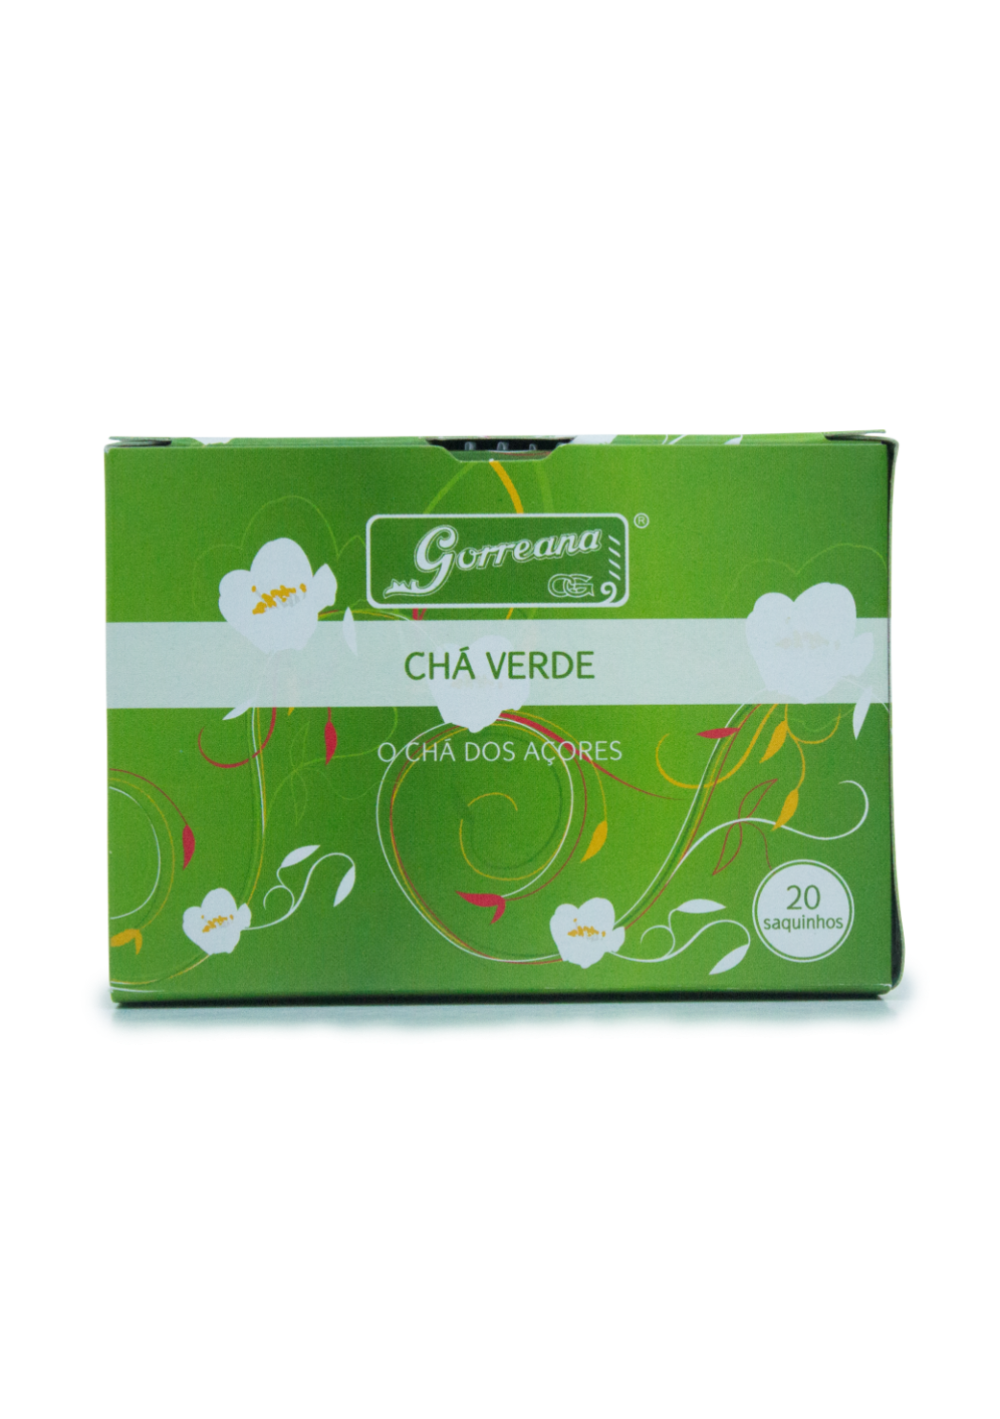 Saquetas de Chá Verde Hysson 20 X 2gr